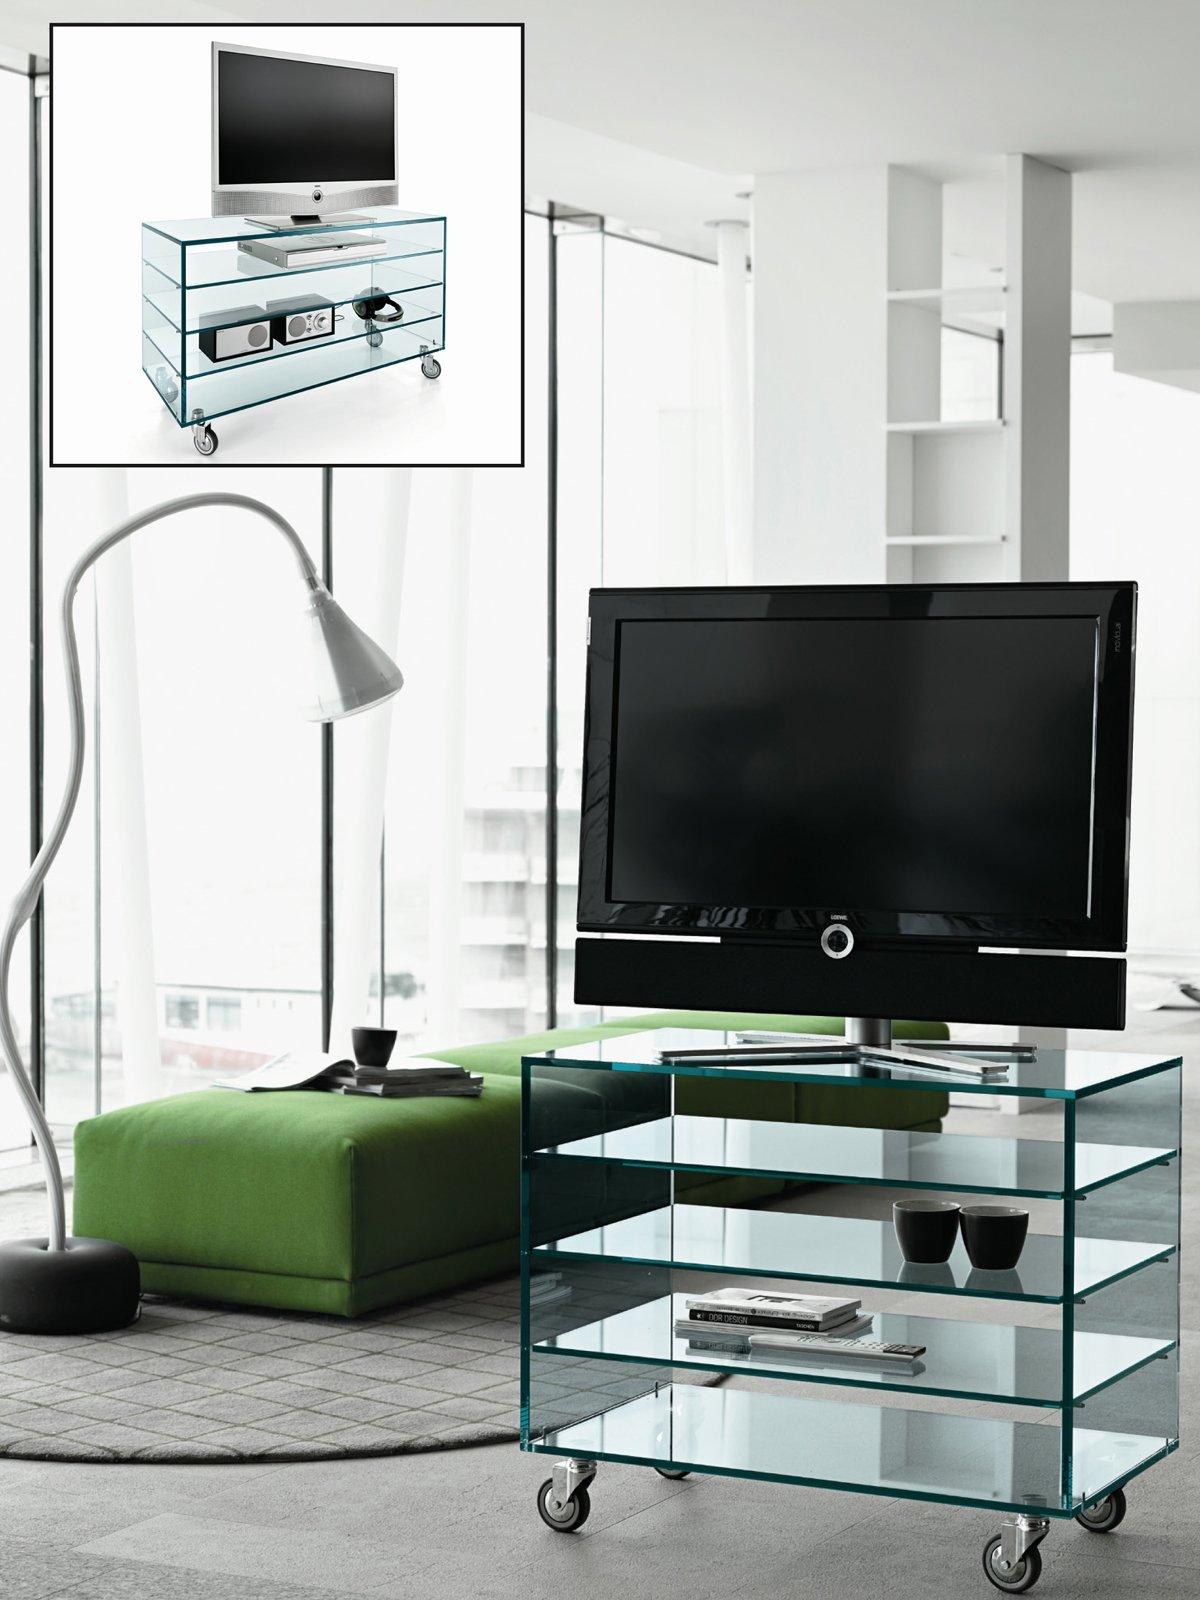 Credenza cucina classica - Mobili porta tv classici ...